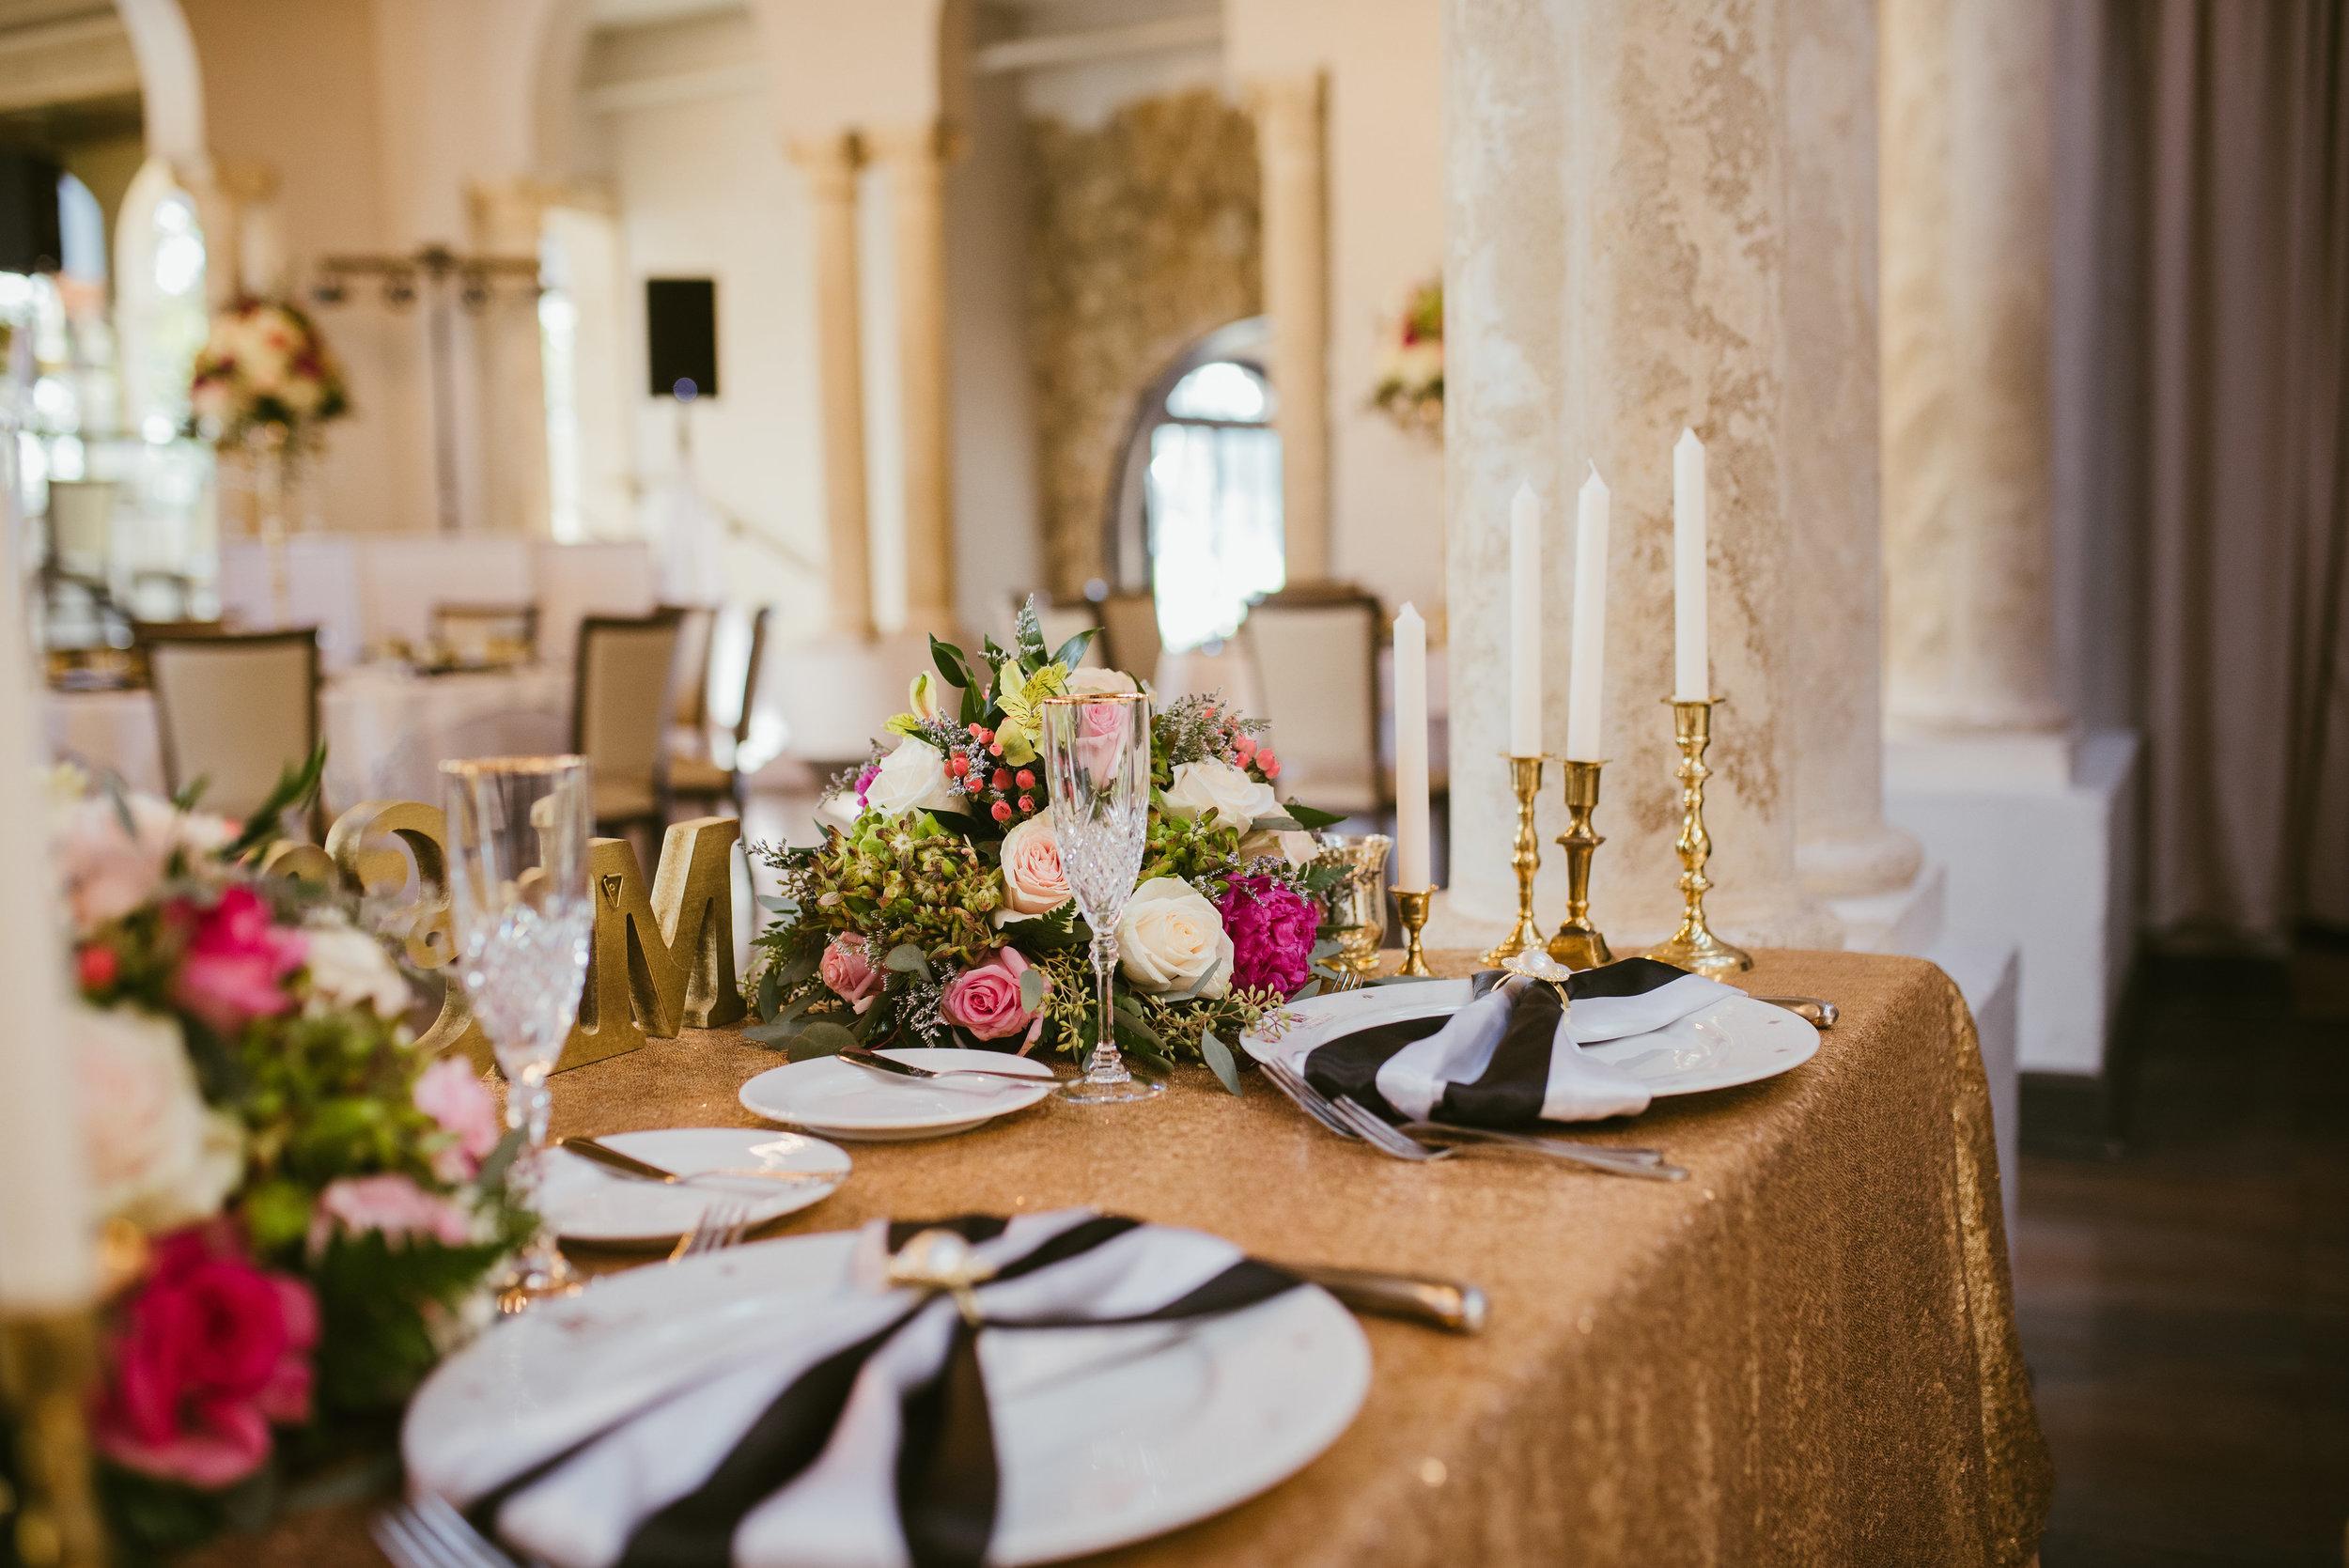 Miami Wedding Photographer - Miami Wedding - Coral Gables Country Club Wedding